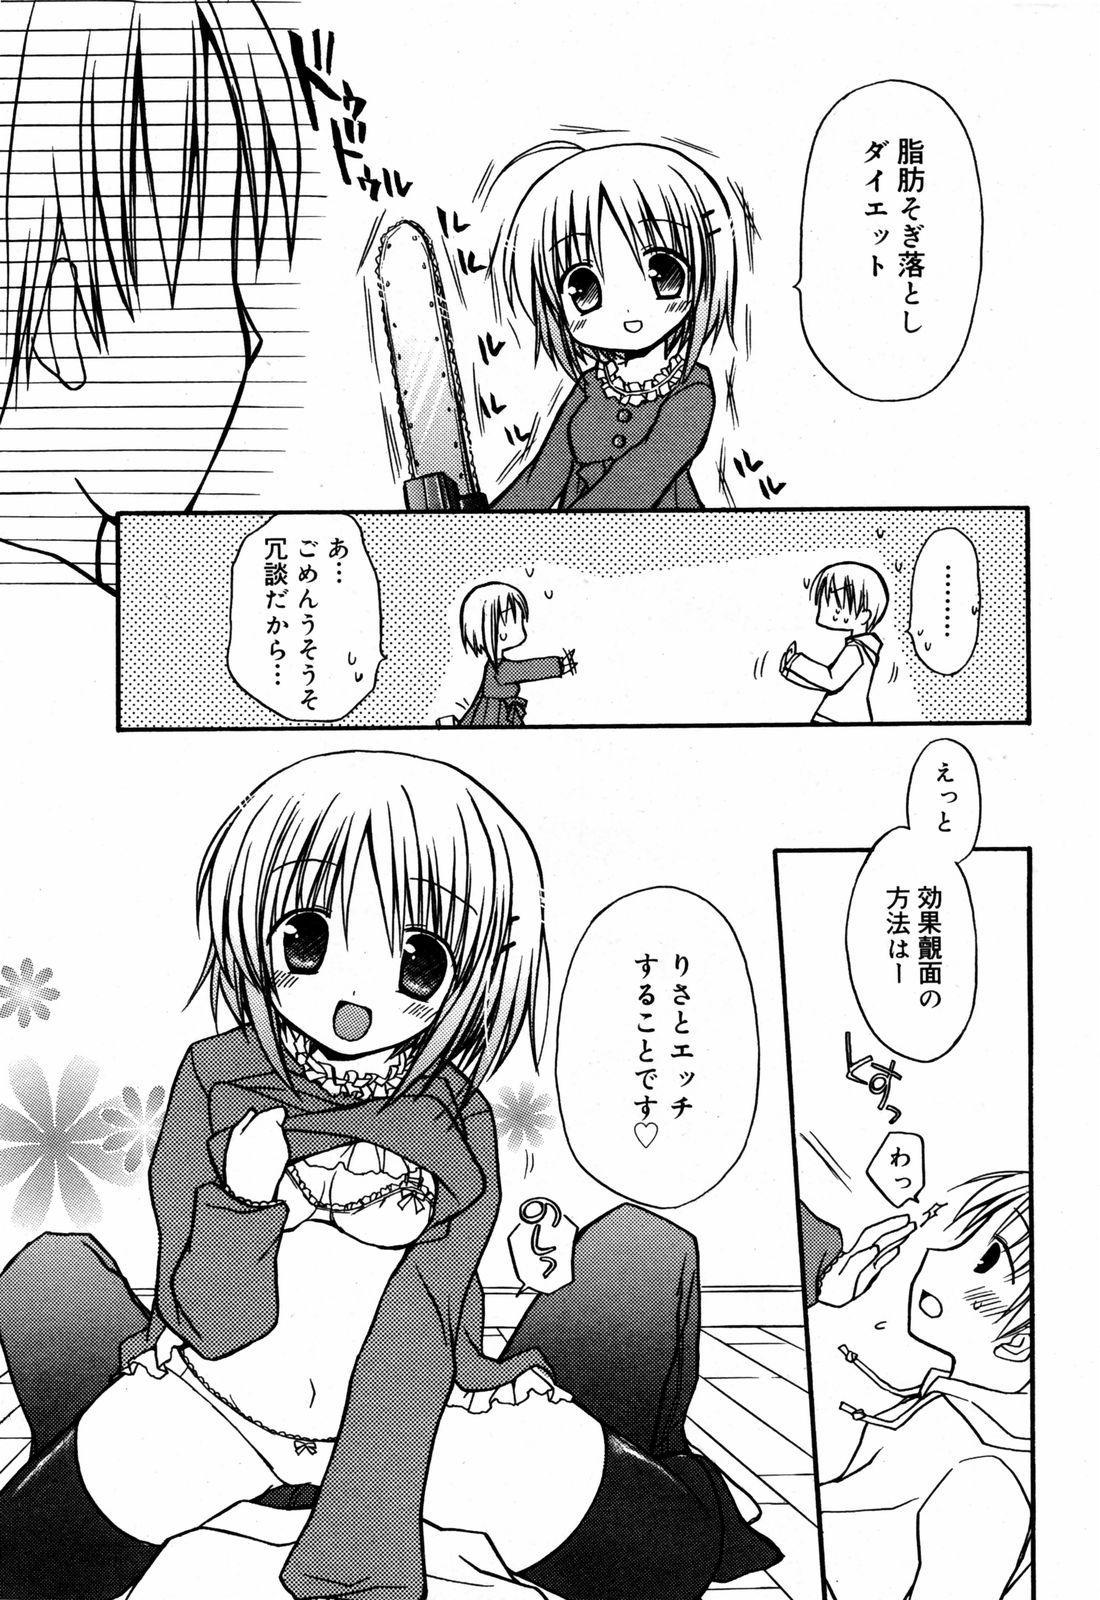 Manga Bangaichi 2008-03 28